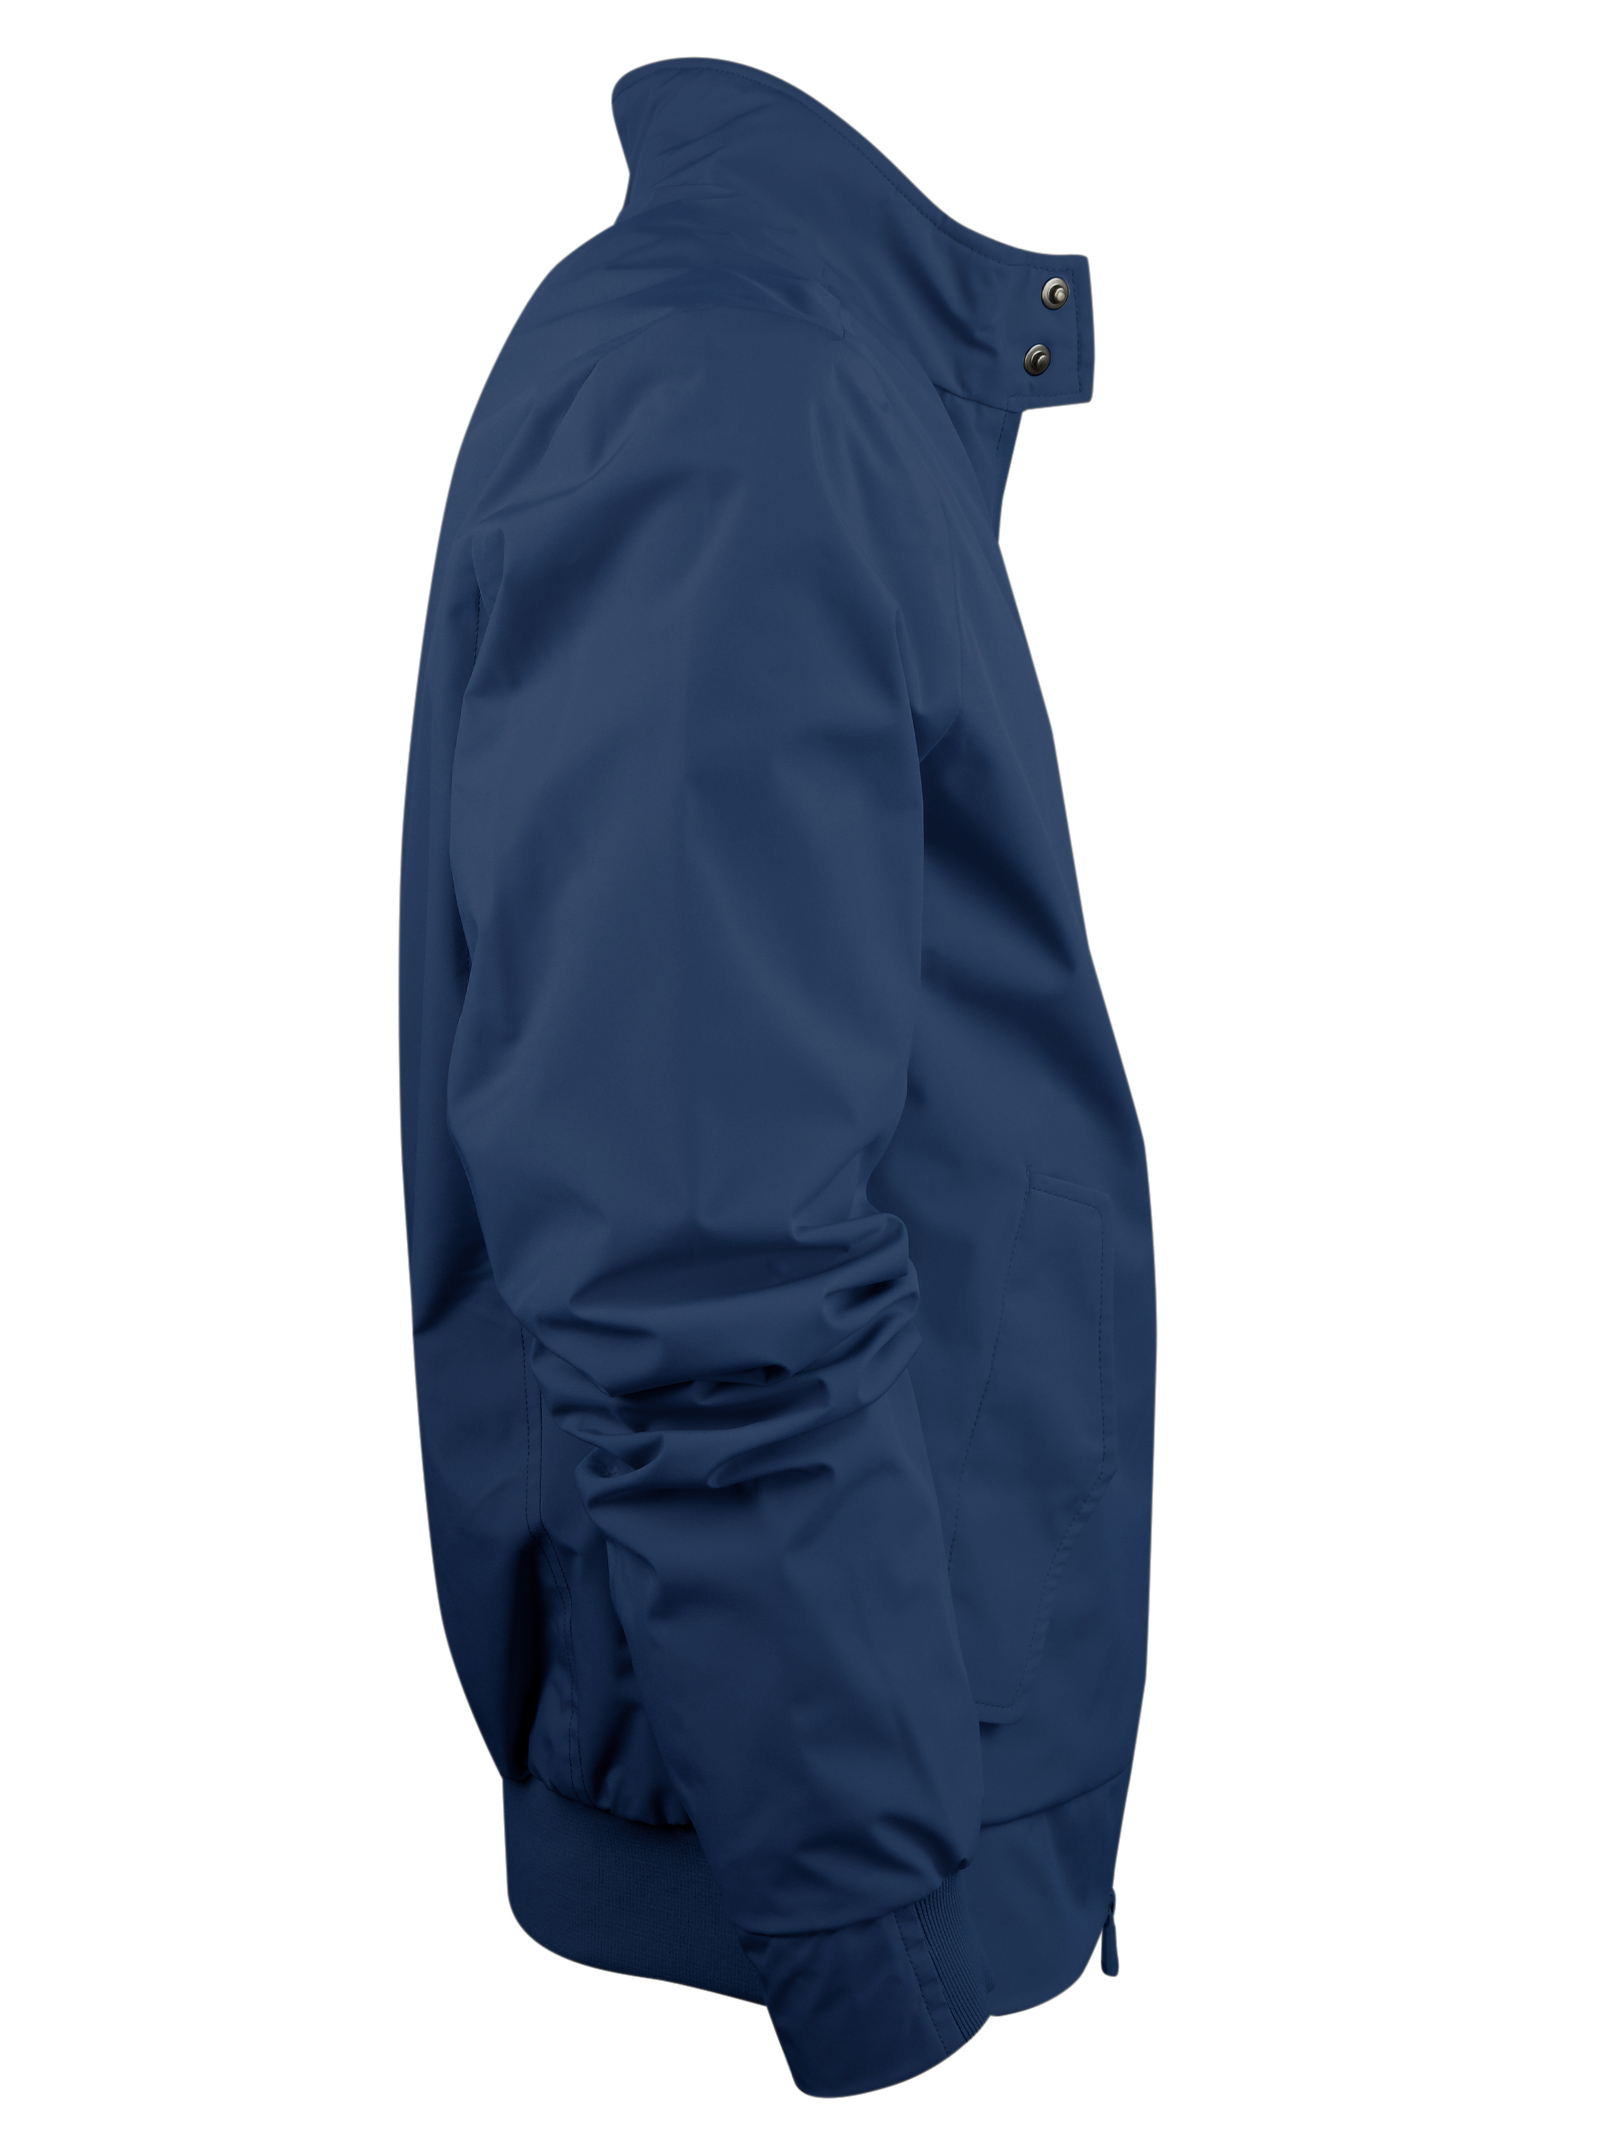 Tech jacket  MUSEUM | Jackets | MS21BEUJA49C242